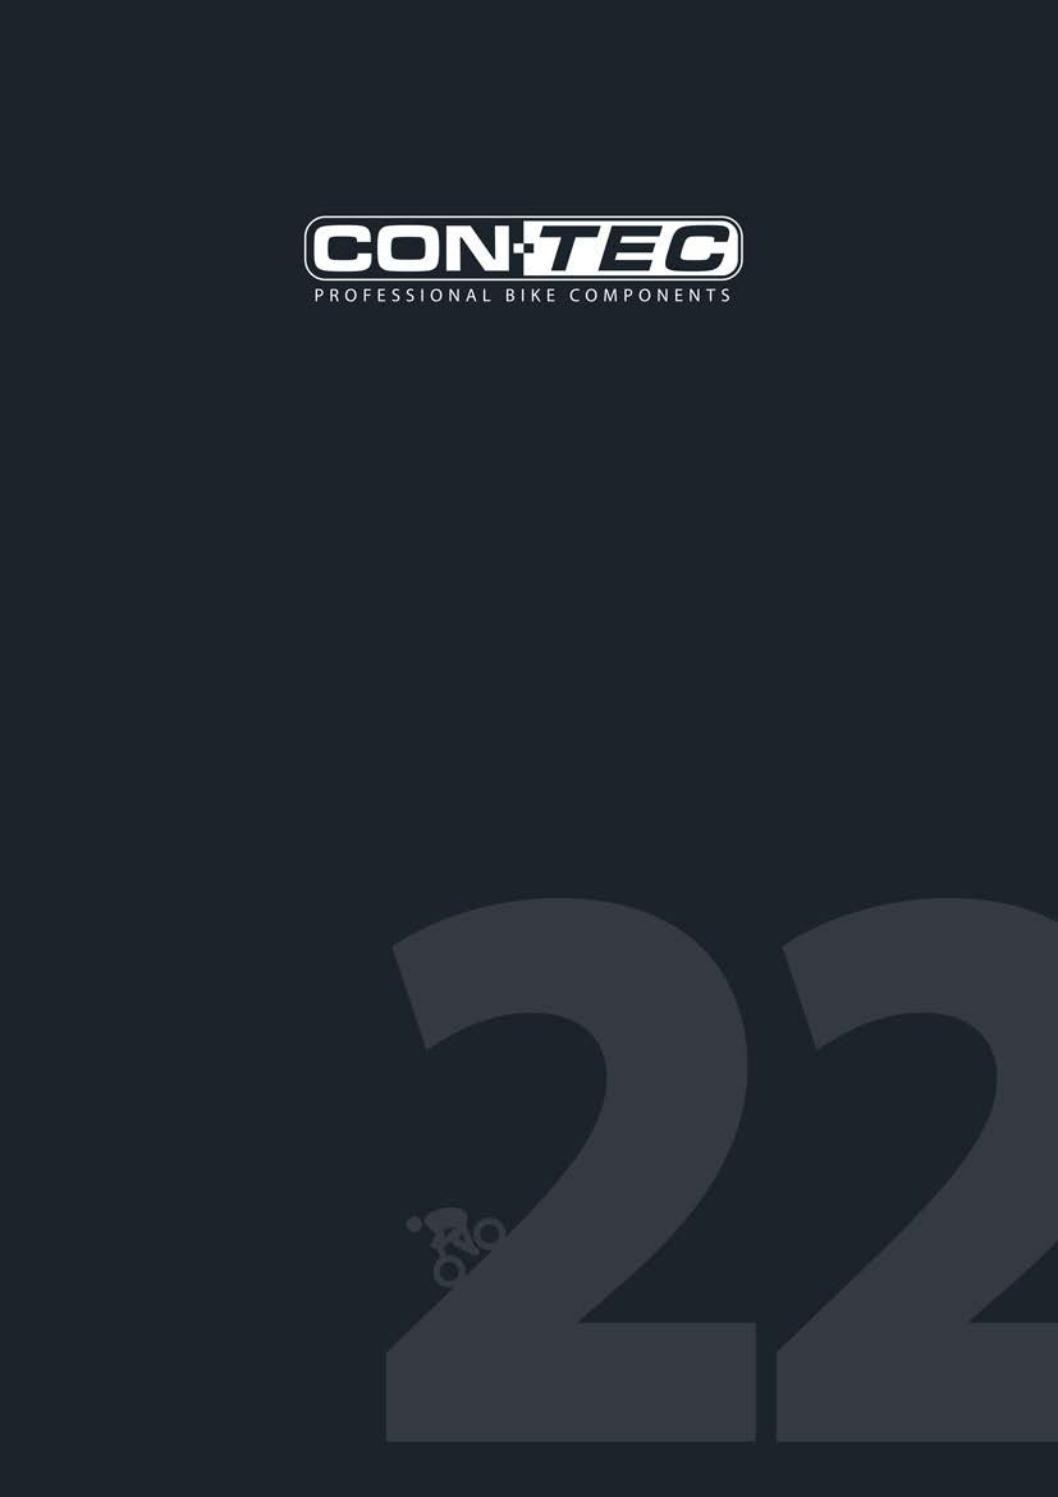 CONTEC Katalog 9 by Hermann Hartje KG   issuu